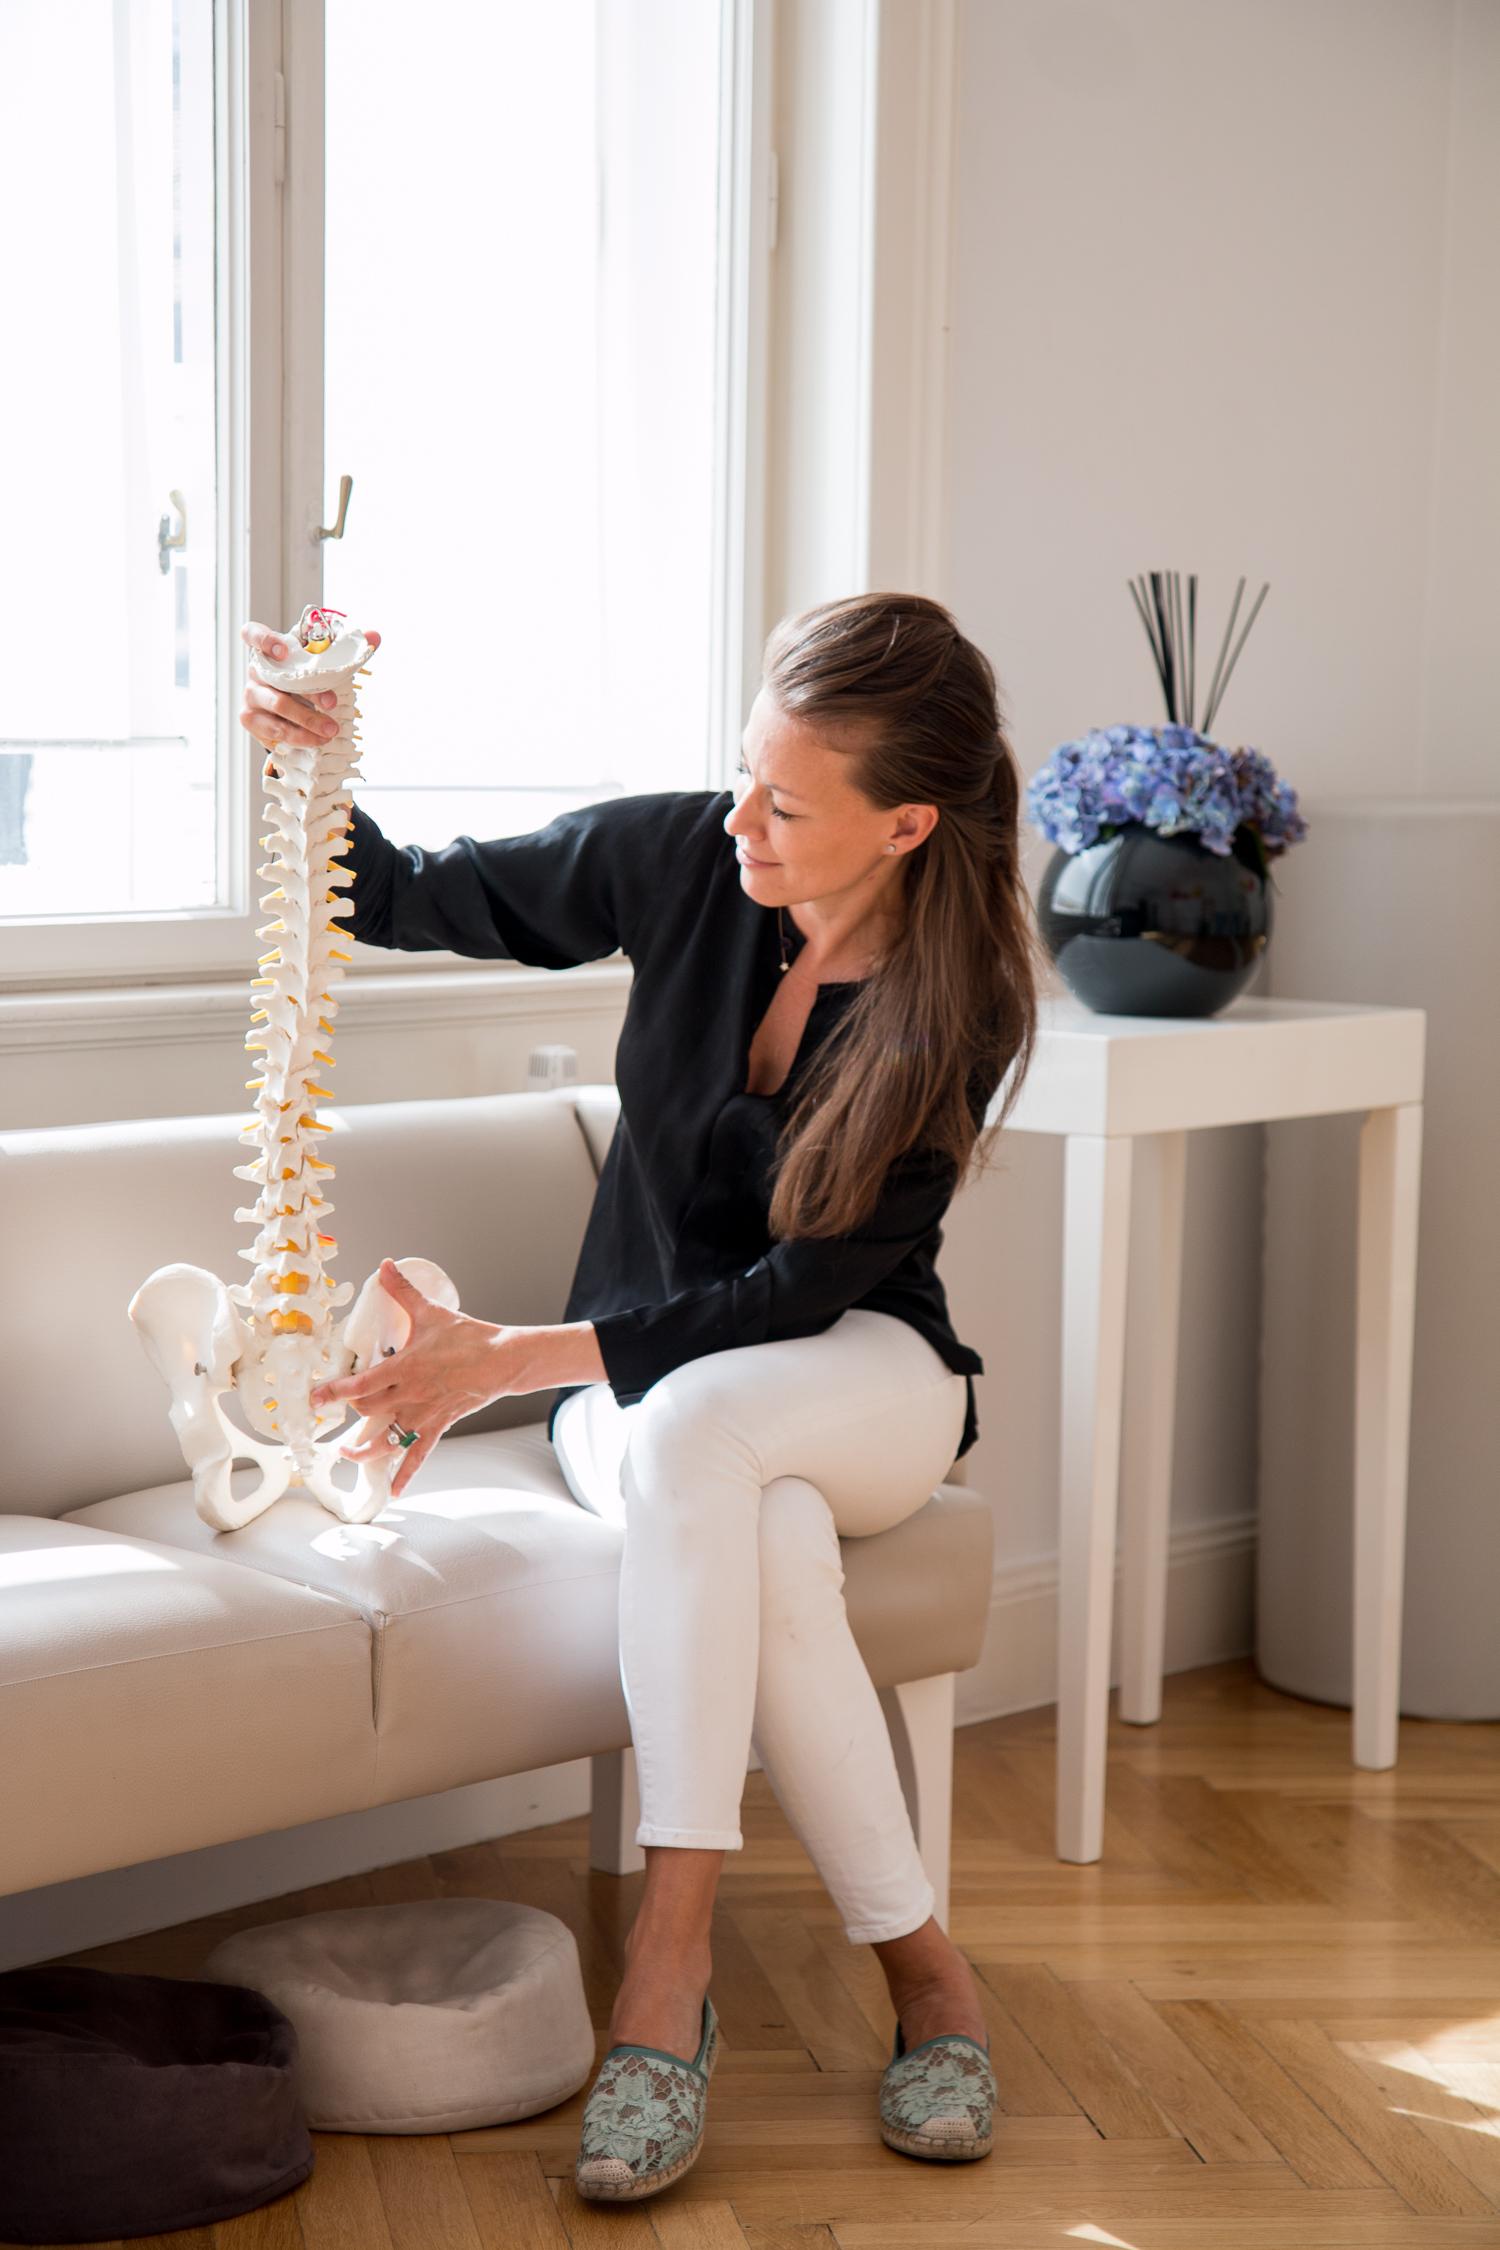 Job Report: Michaela Kainz, Wien Praxis Kainz Physiotherapie Prävention Beratung | Love Daily Dose